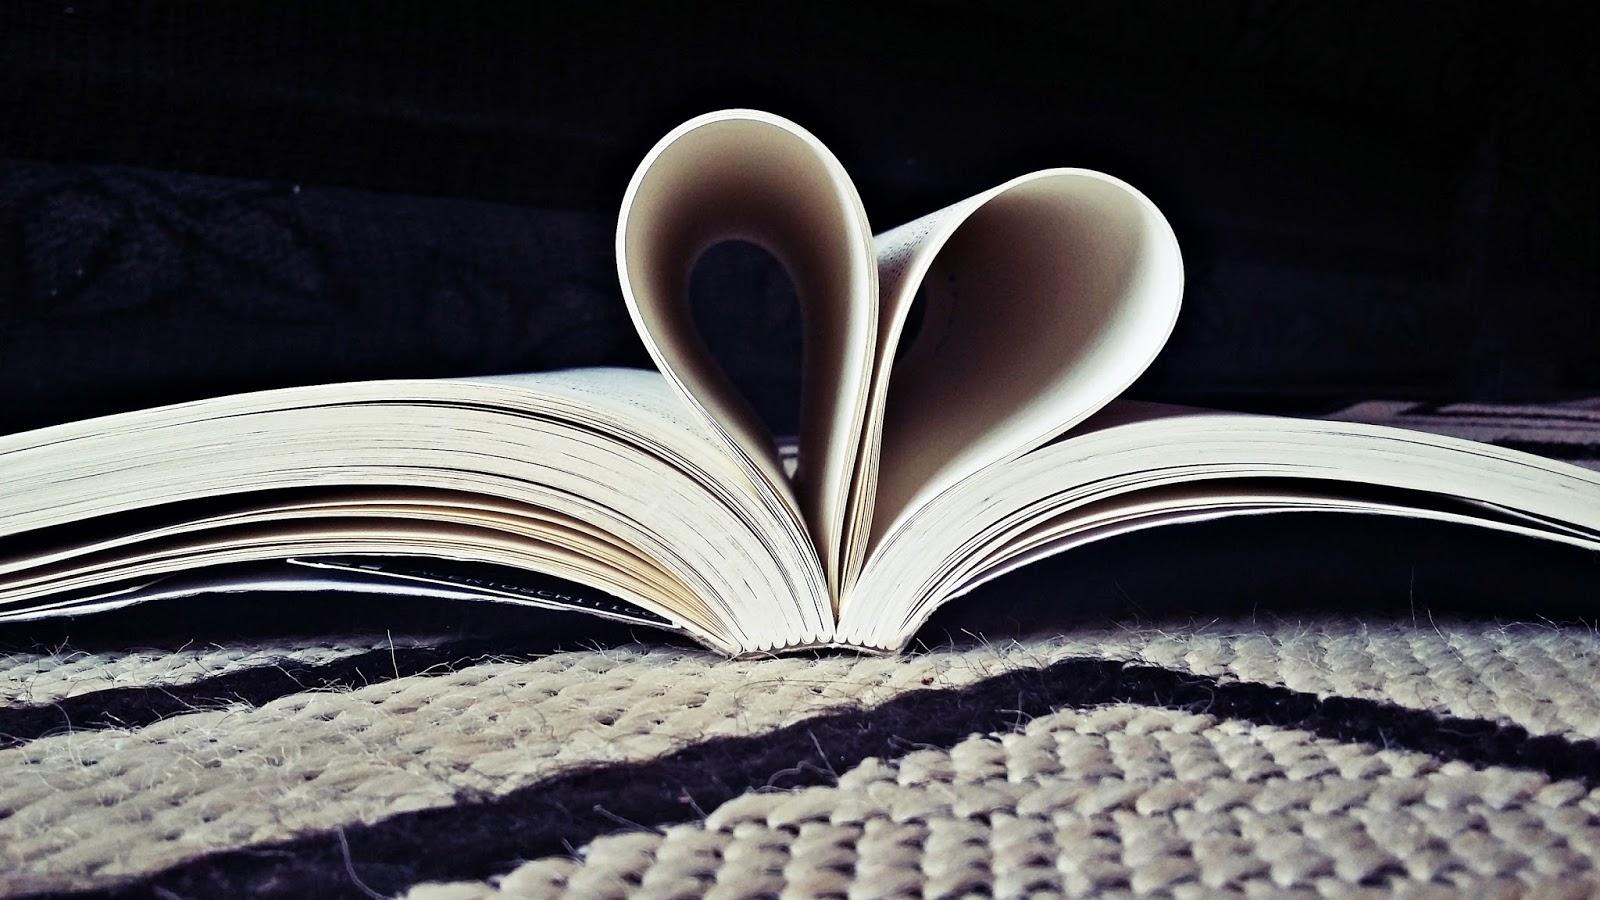 Resenha do livro Entre o agora e o nunca